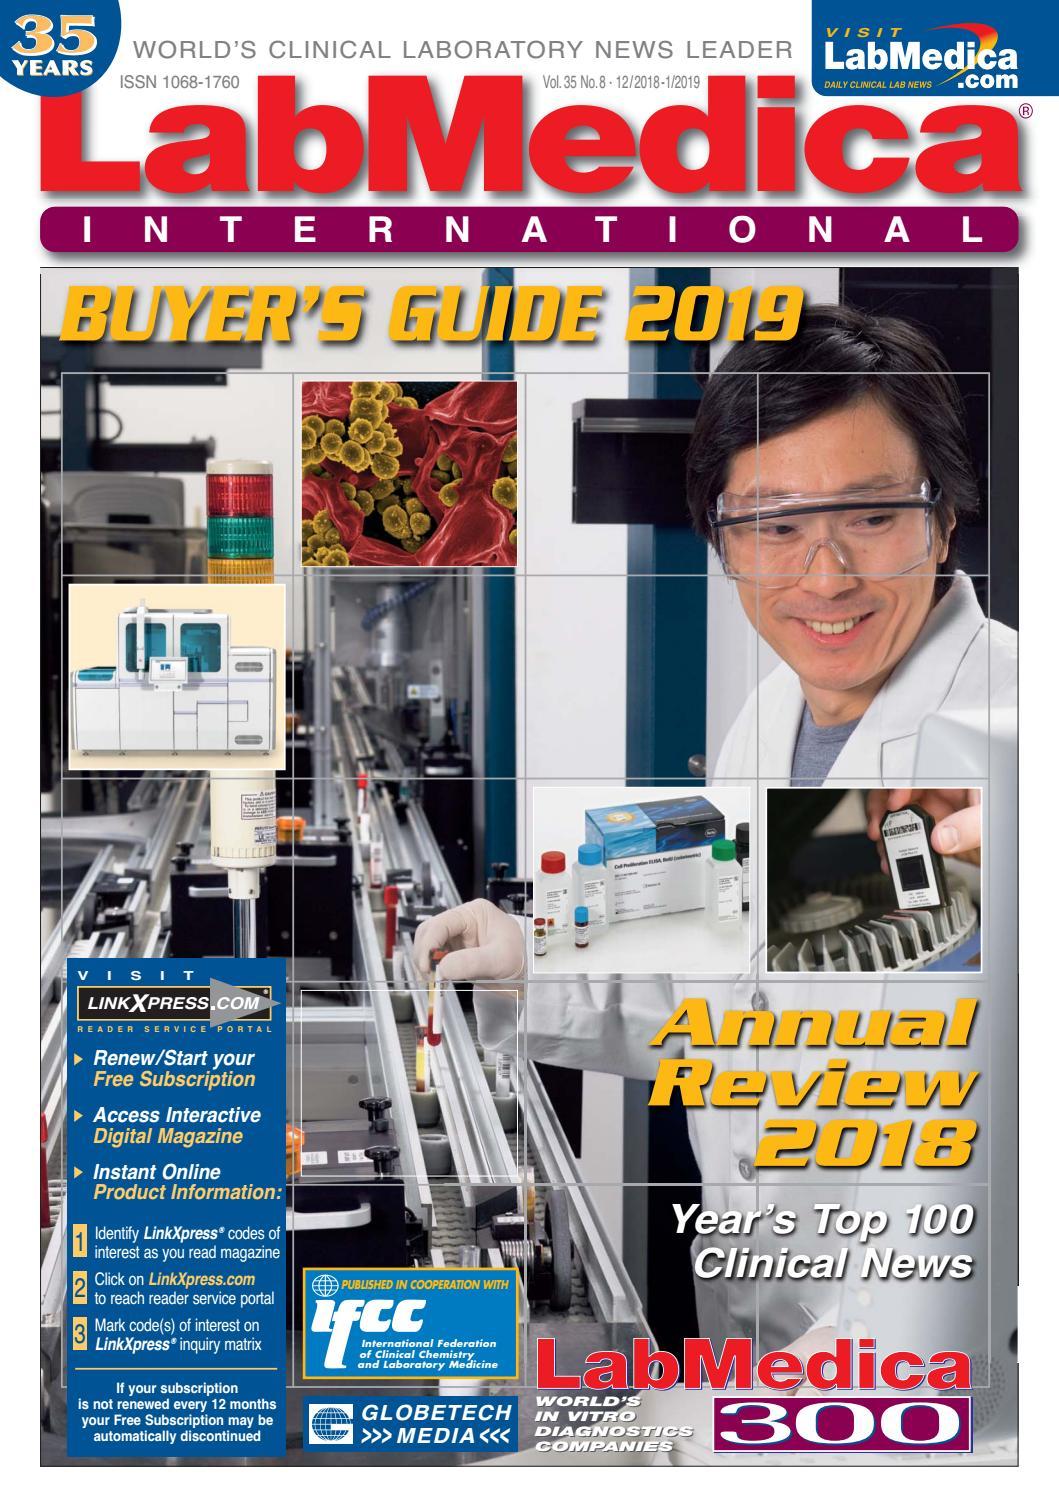 LabMedica International January 2019 by Globetech - issuu